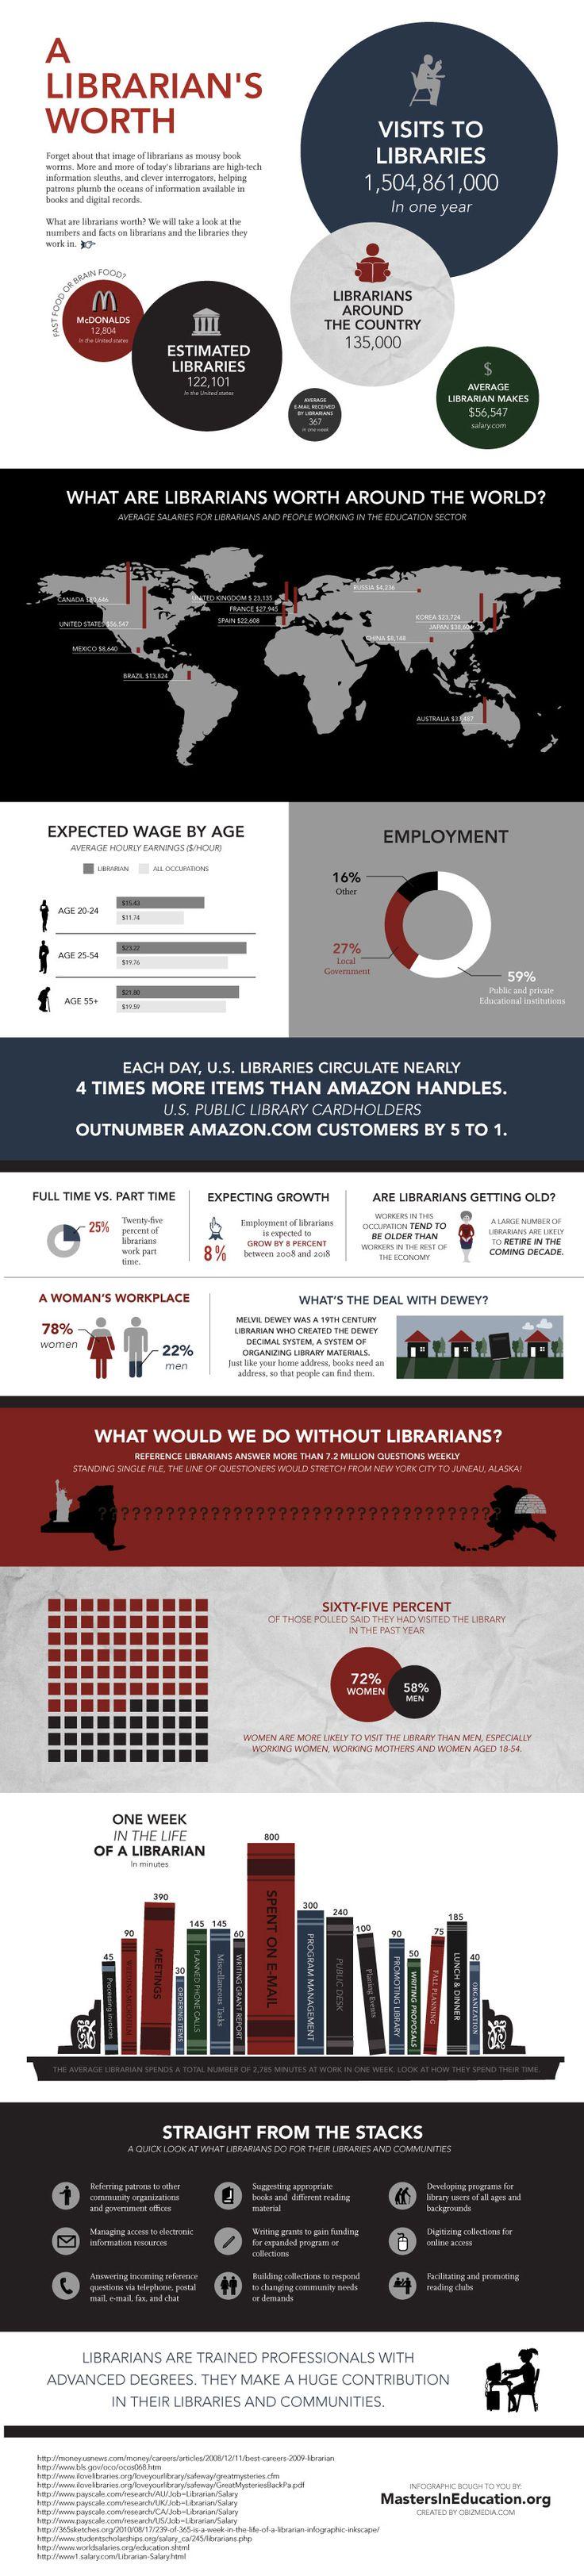 The Value of Librarians! « The Gun-Carryin' Librarian